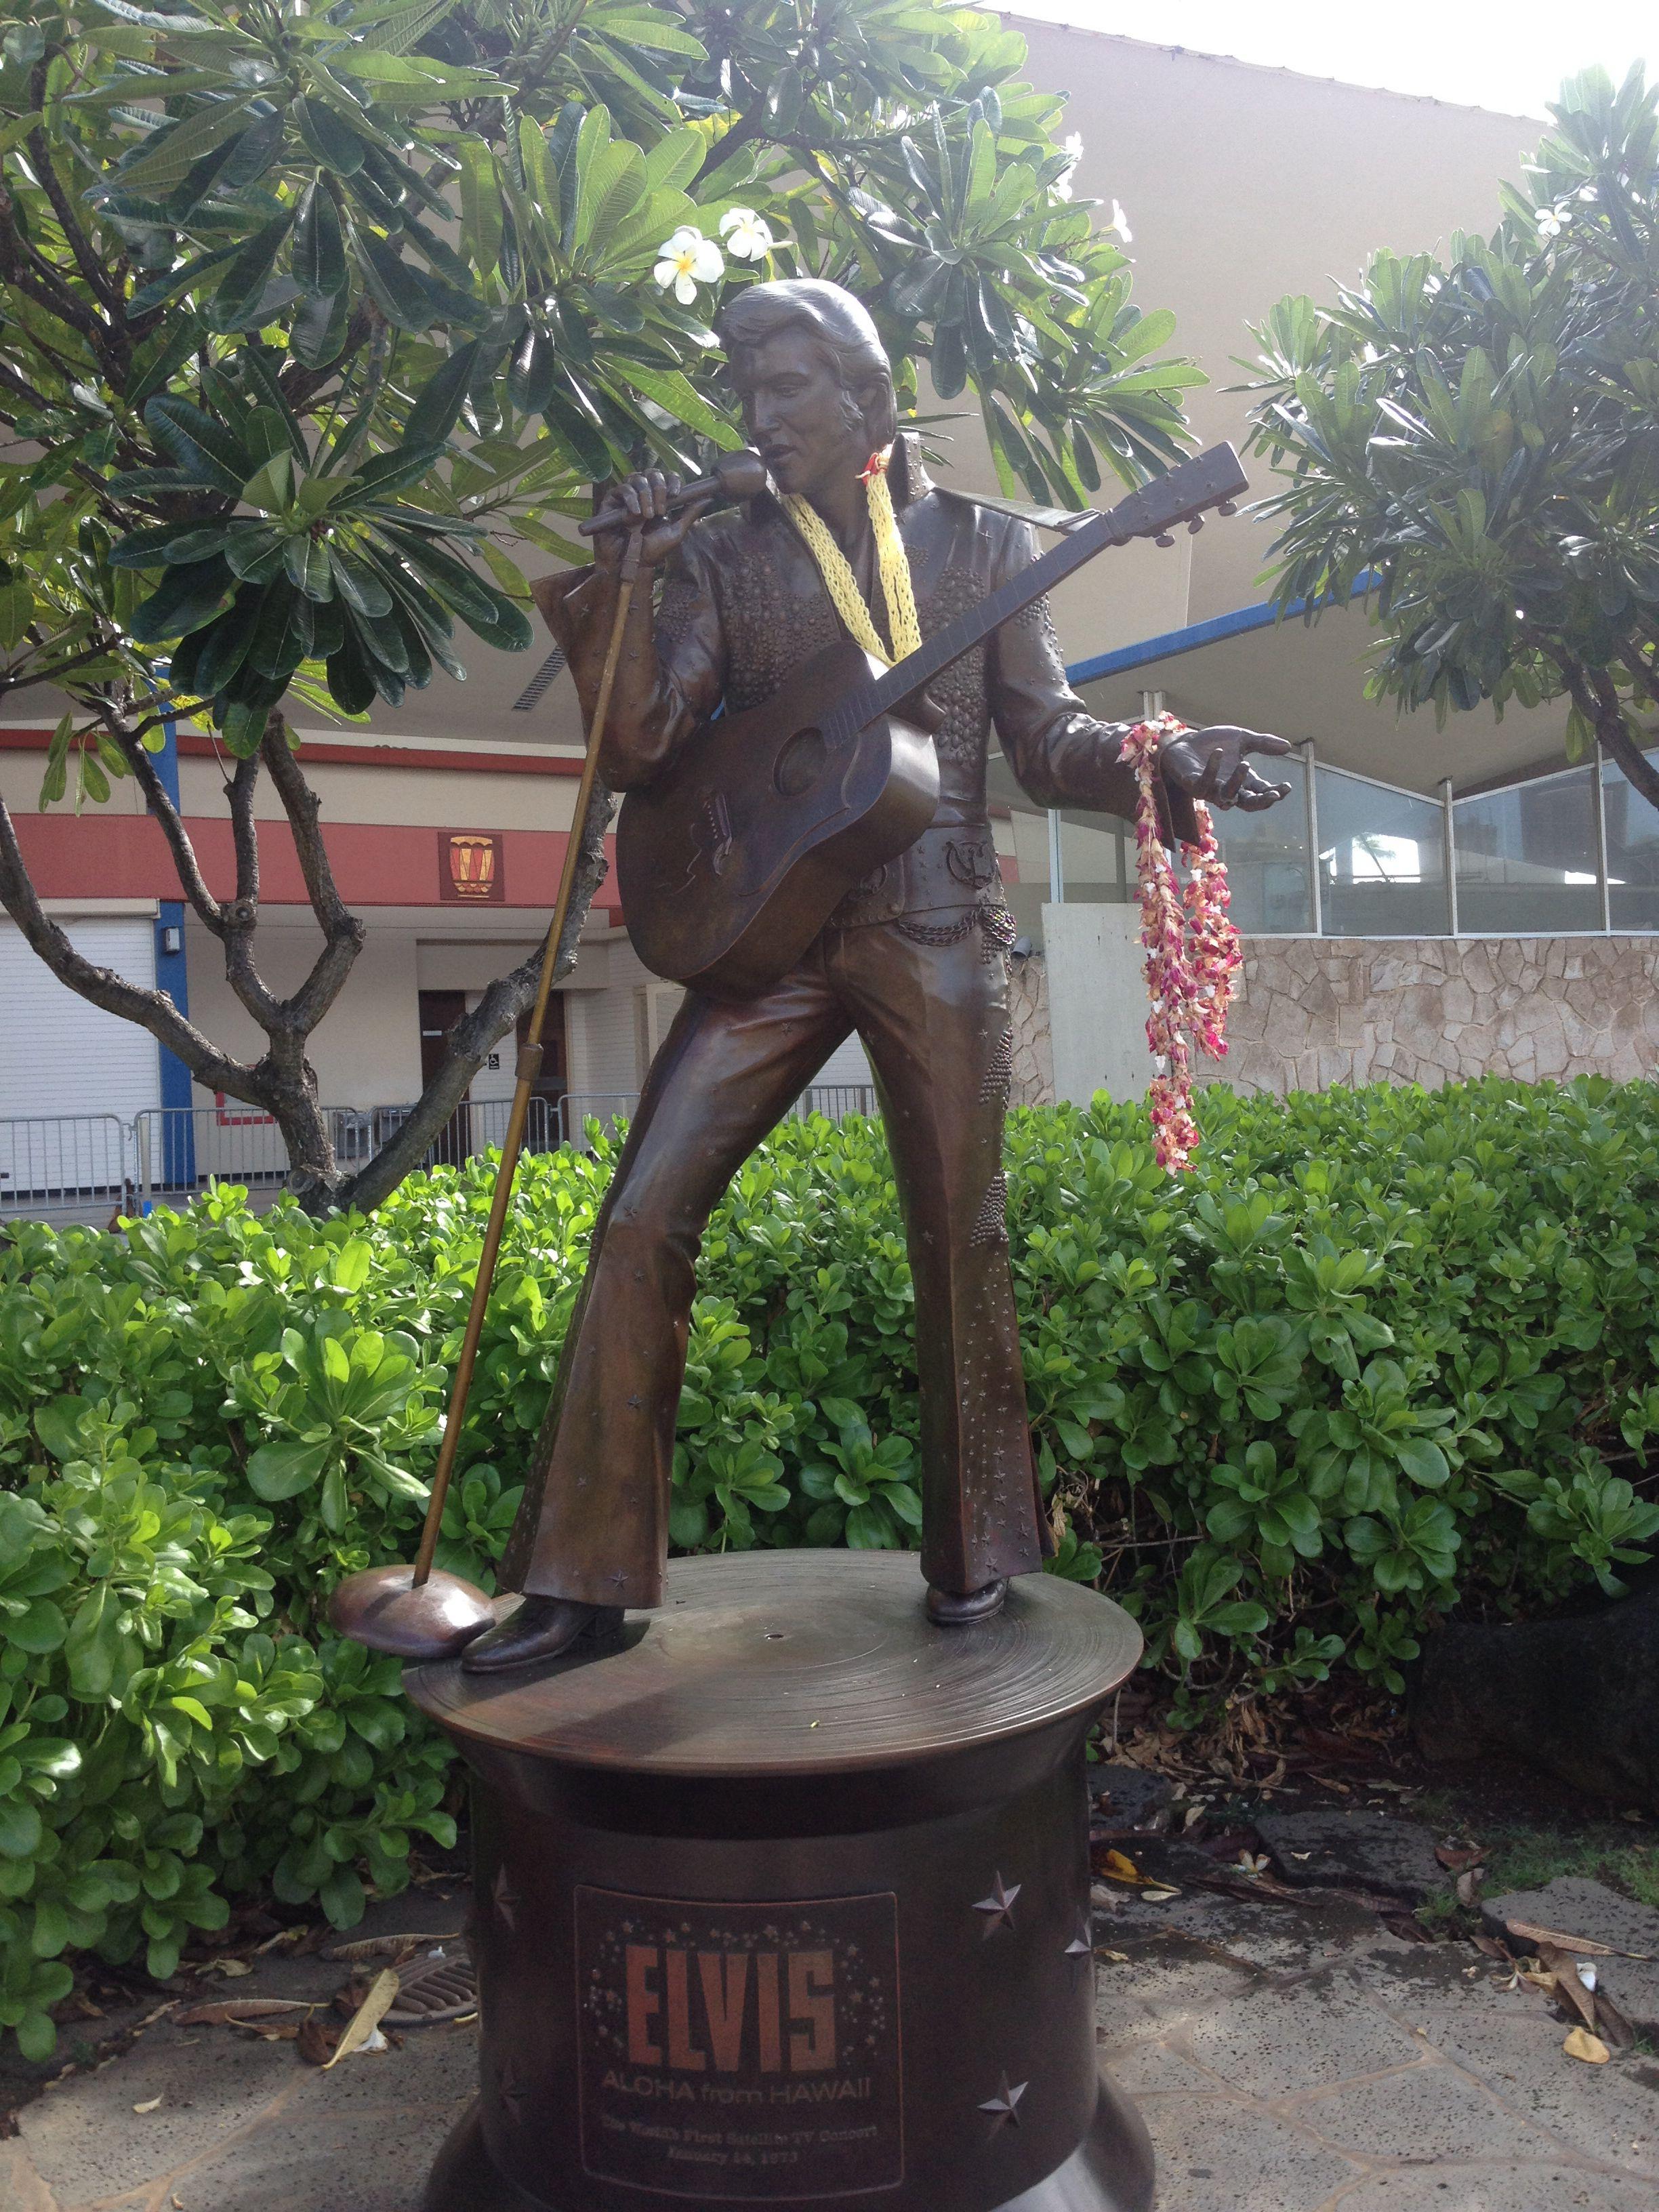 Elvis statue in Waikiki Hawaii. Aloha from Hawaii.